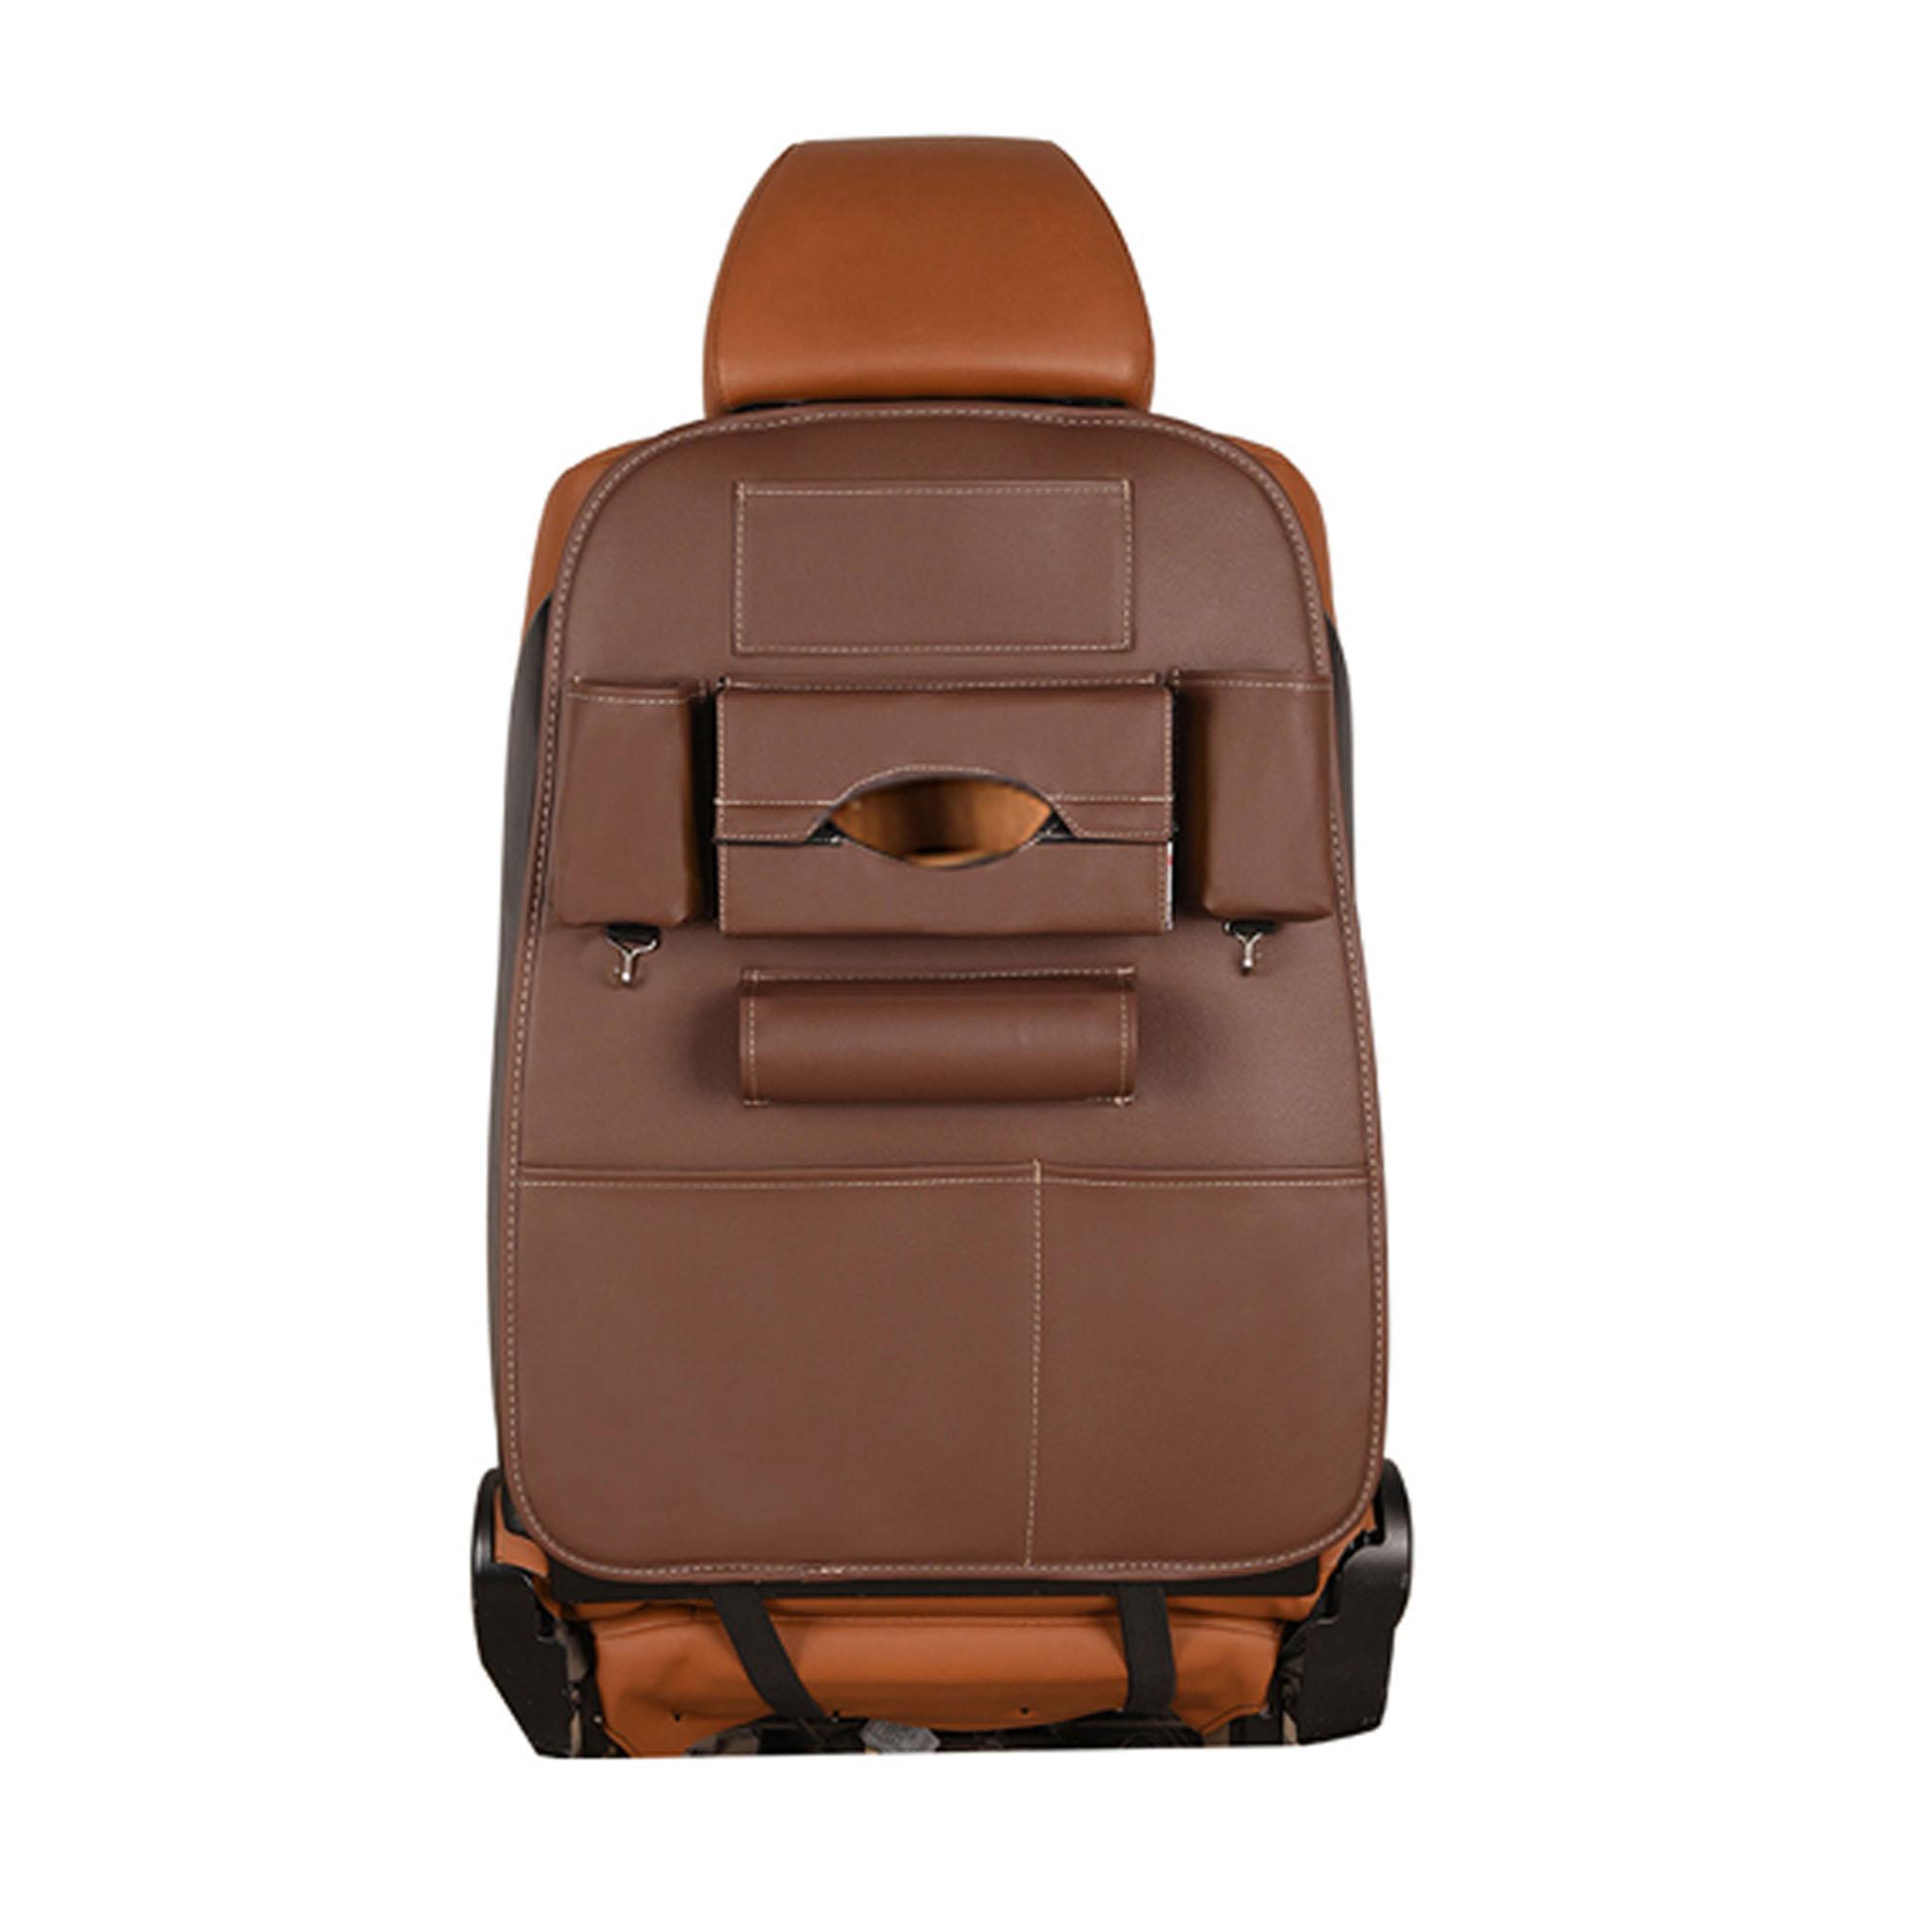 Car Seat Back Storage Bag Organizer Travel Box Pocket - Brown